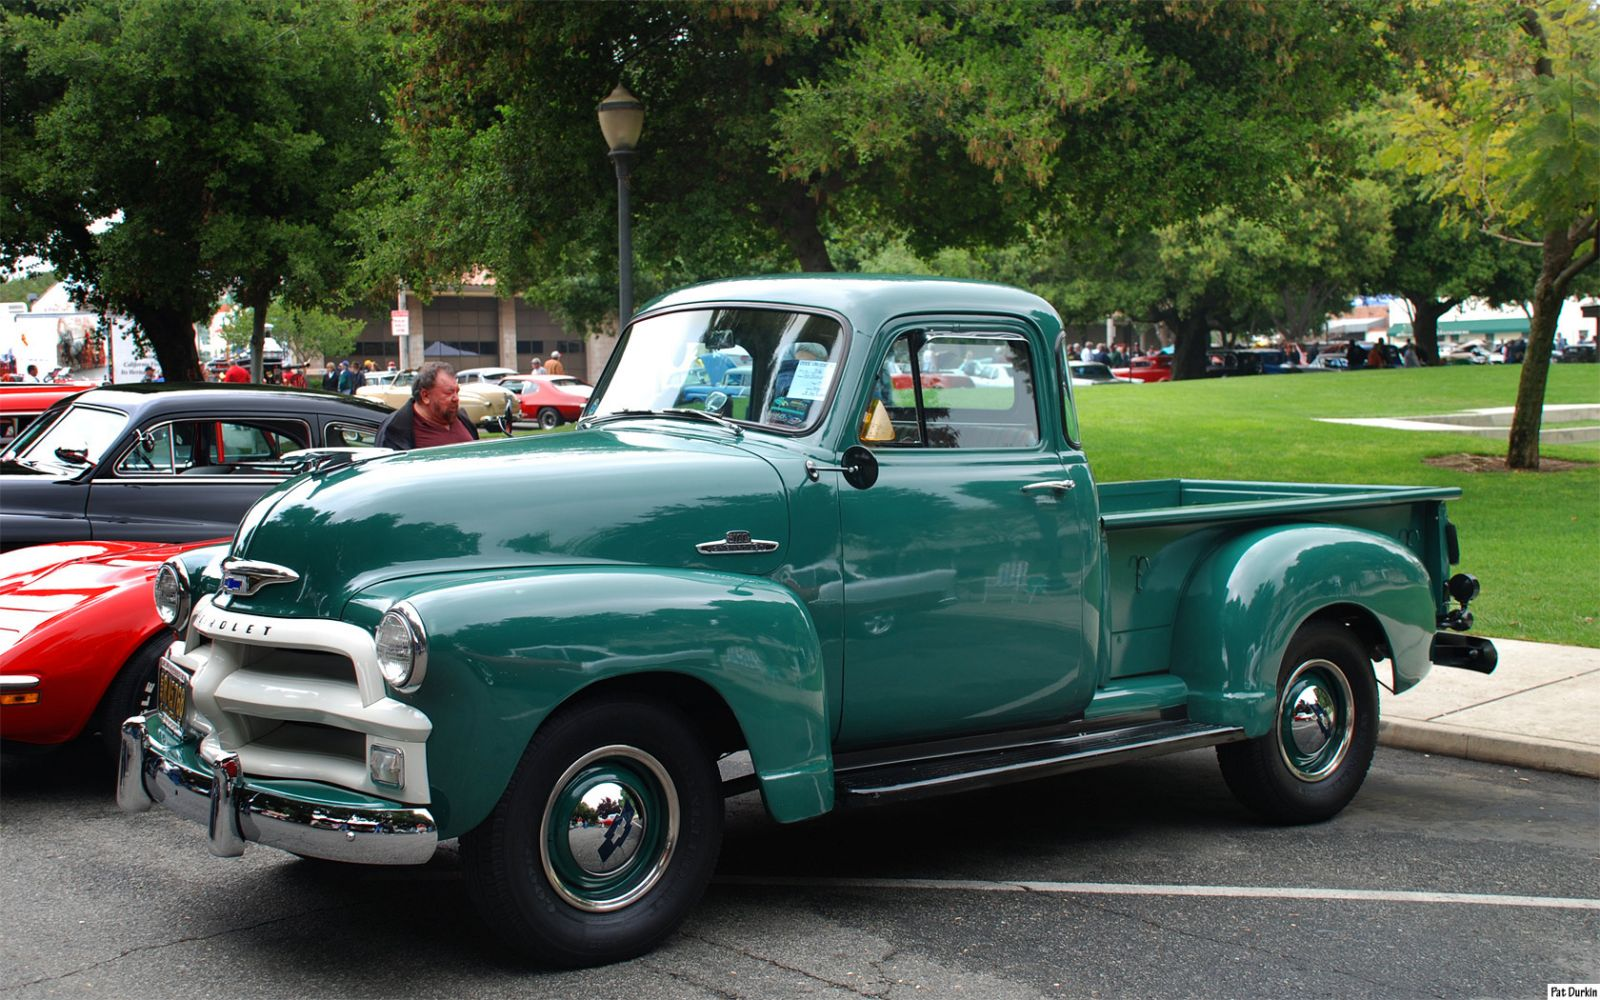 All Chevy 1955 chevrolet 3100 : 1955 Chevrolet 3100 Pickup - Glade Green - fvl - General Motors ...